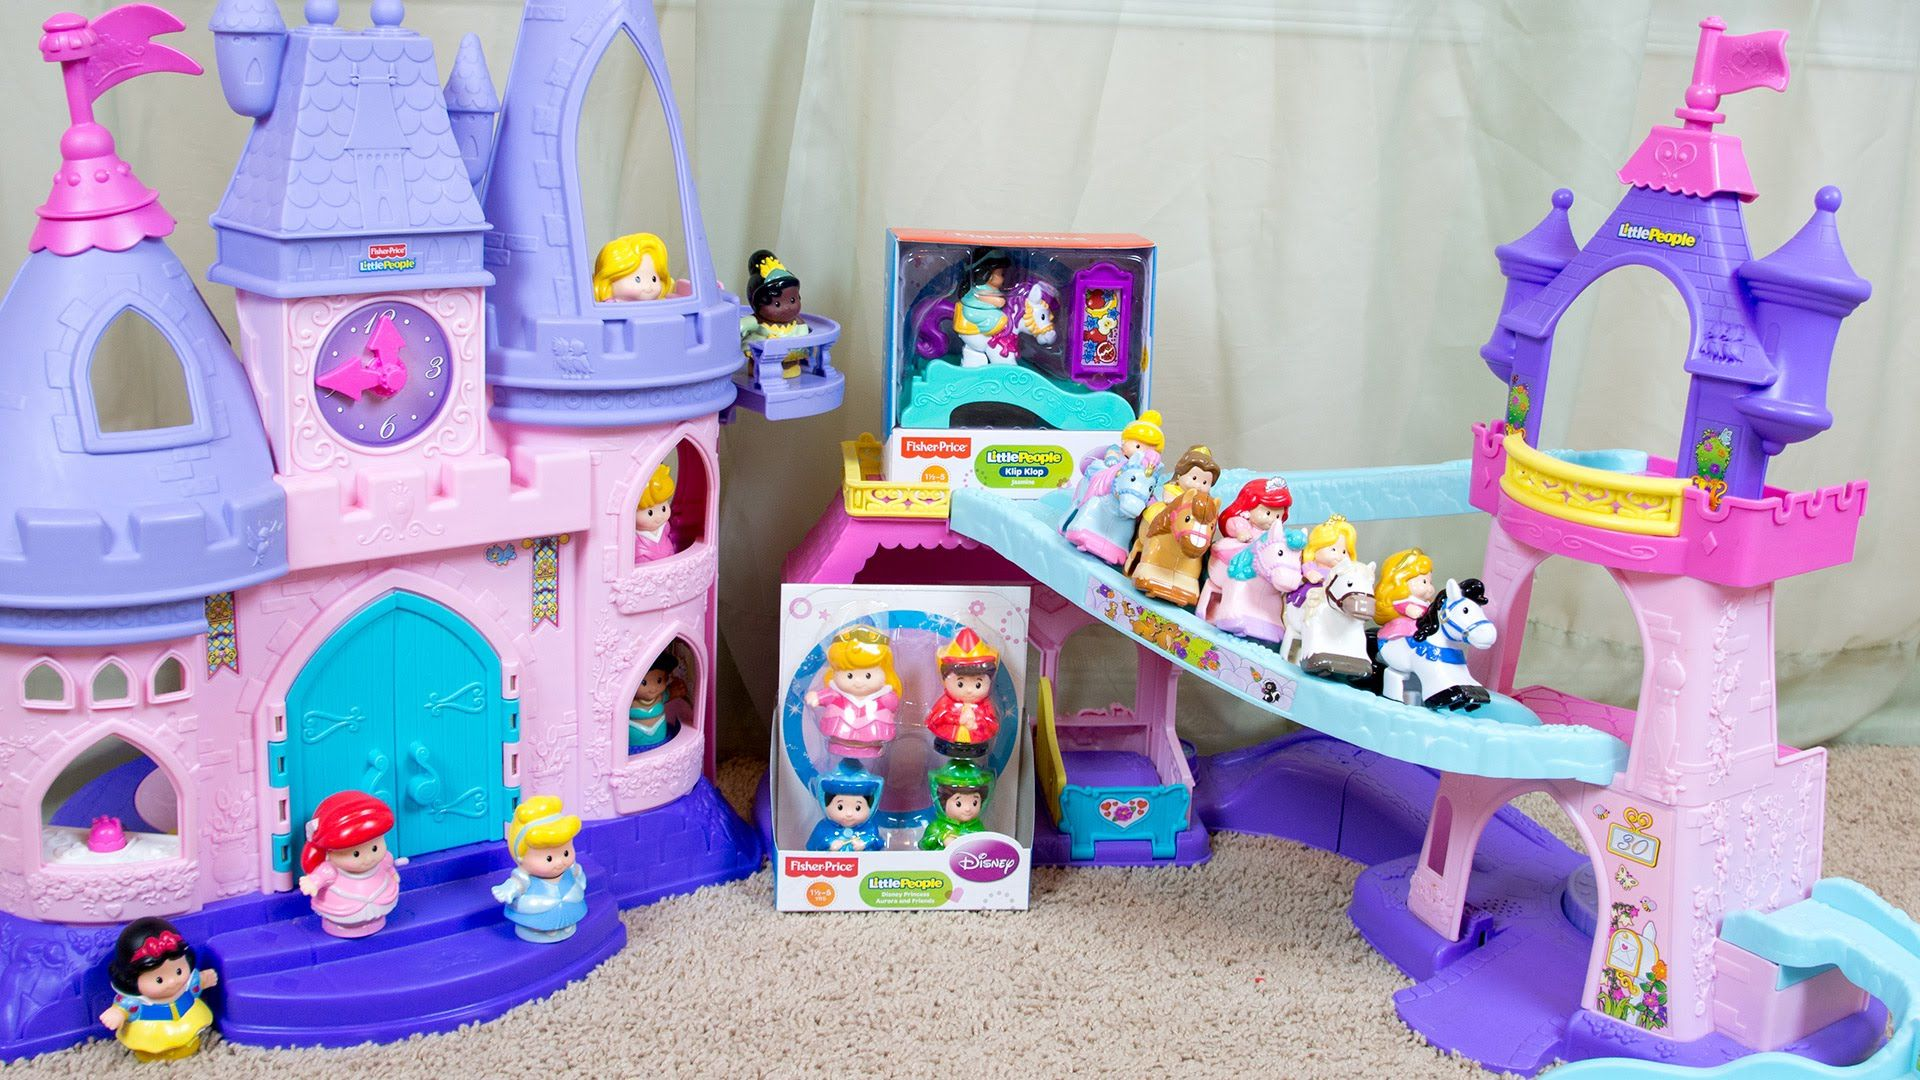 Fisher Price Little People Disney Princess Aurora and Friends Klip